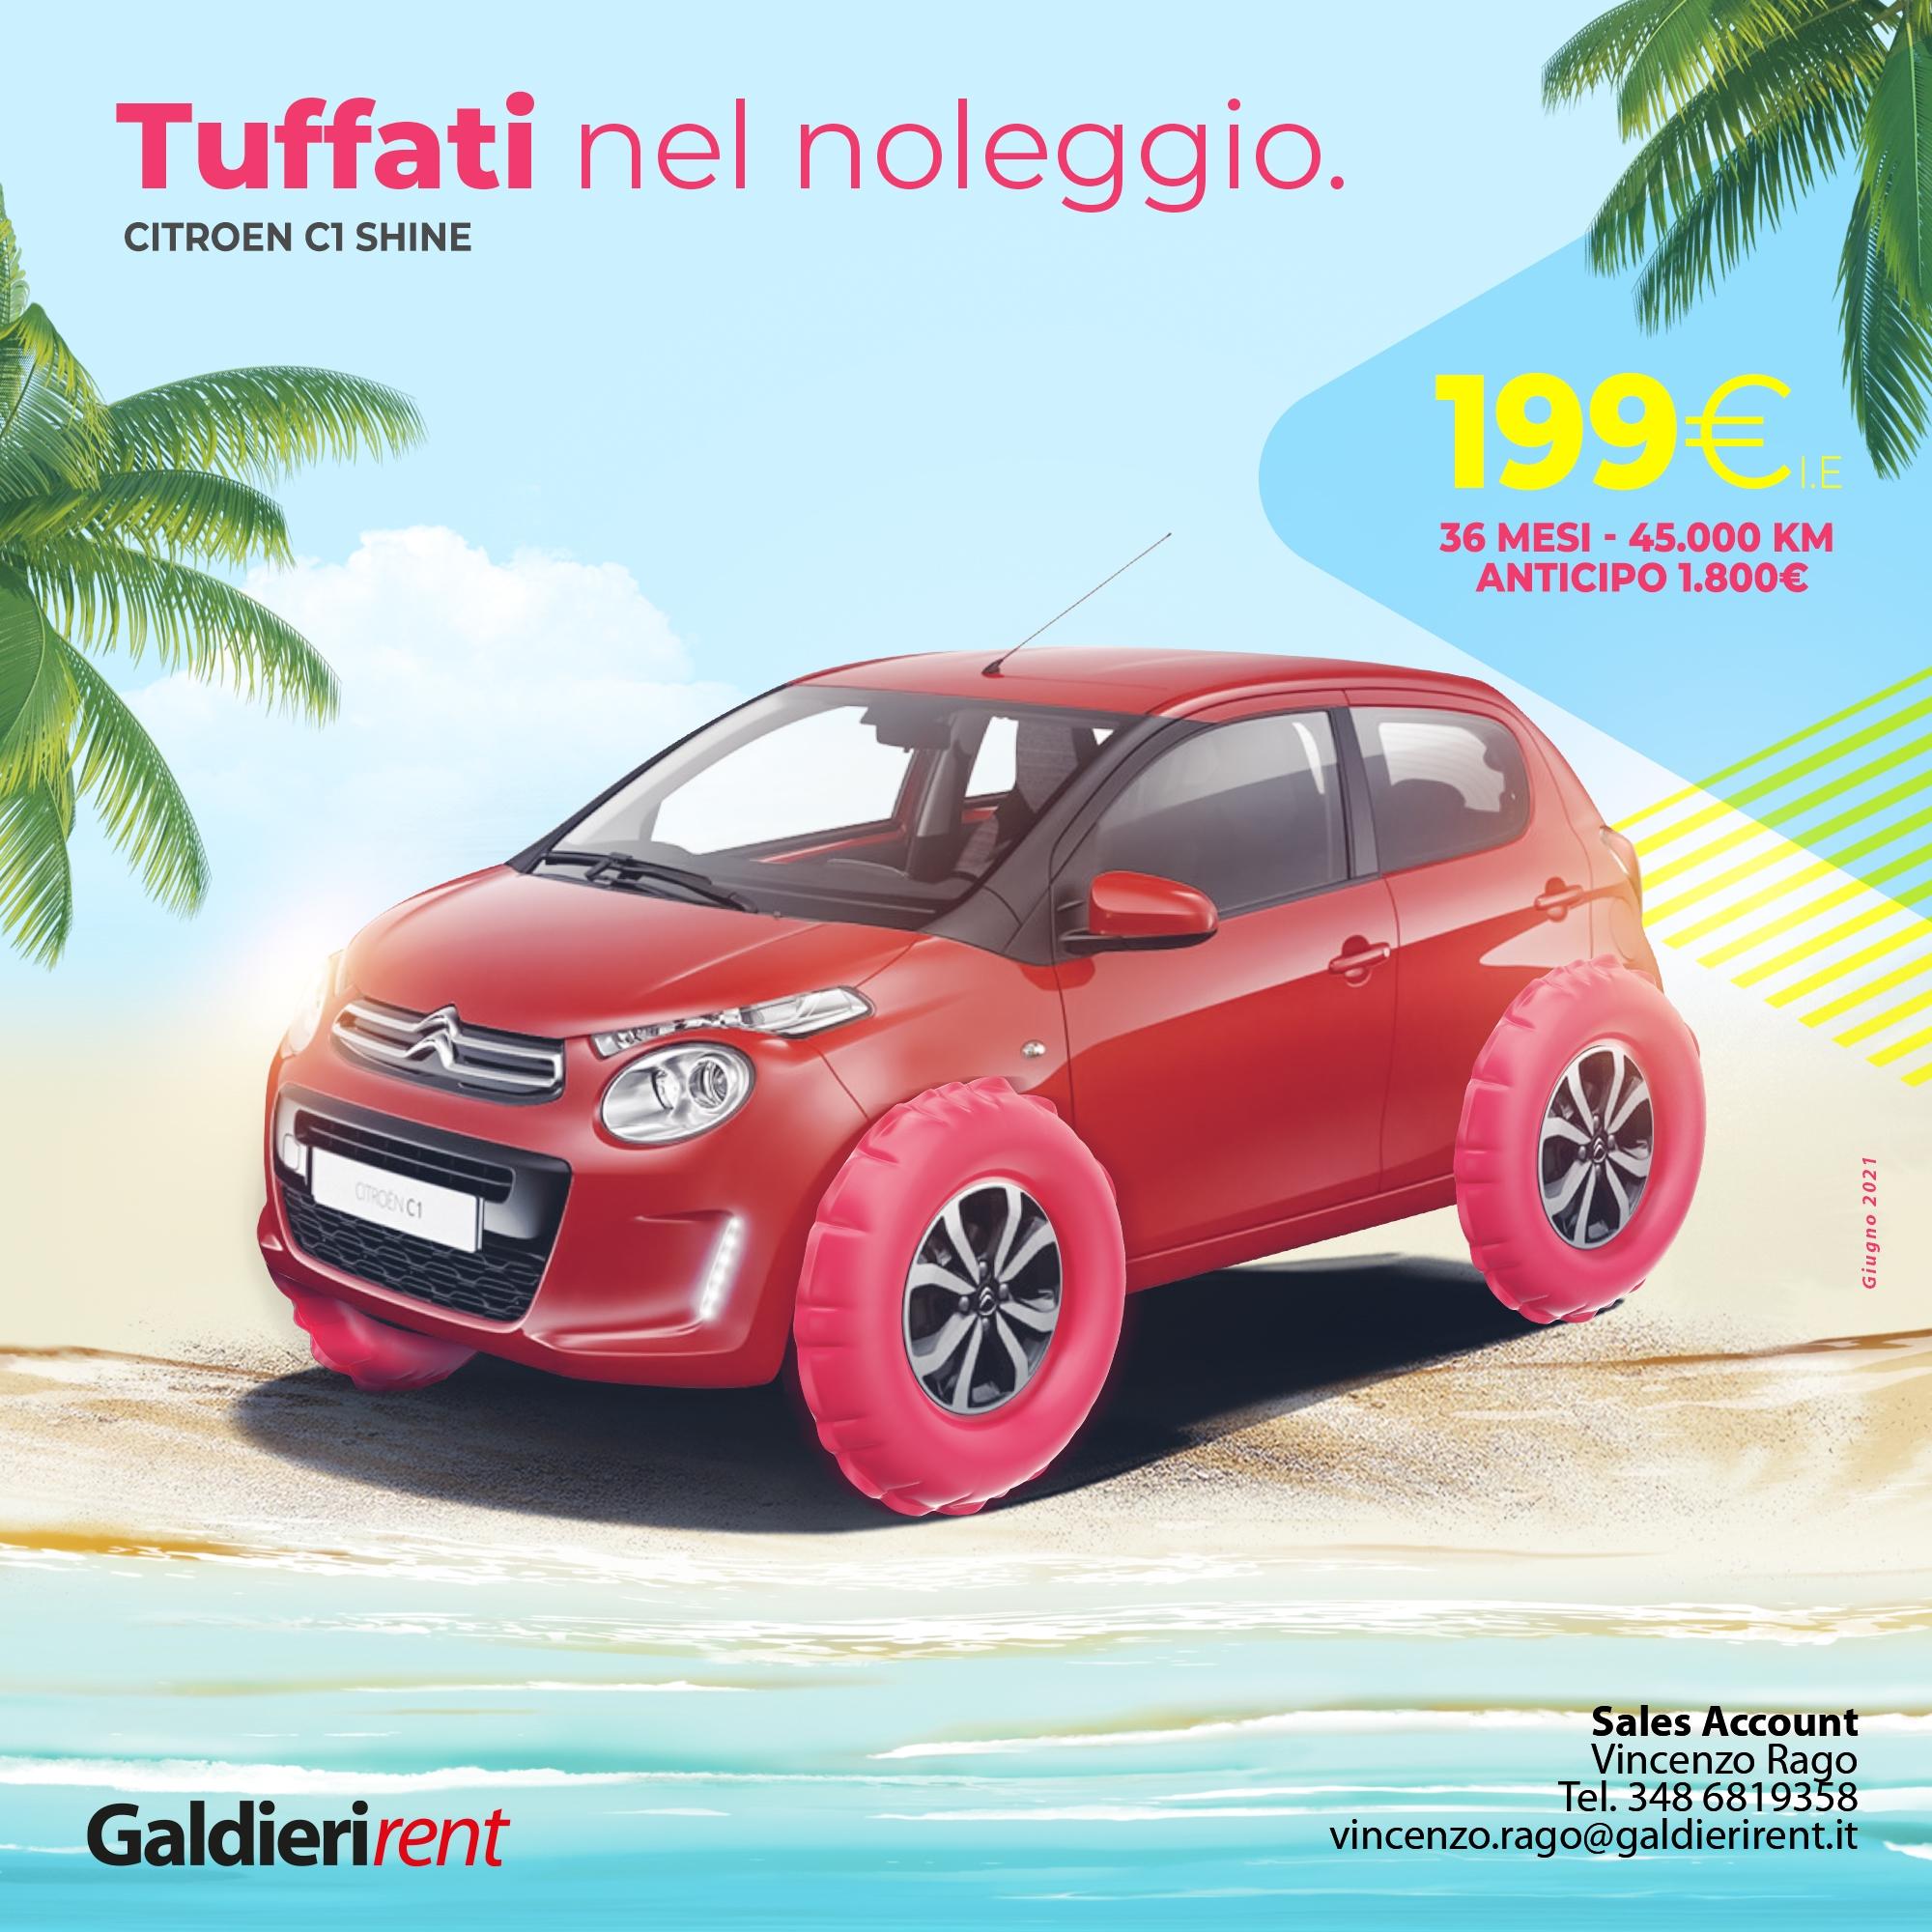 Vincenzo-Rago_06_C1_20210622